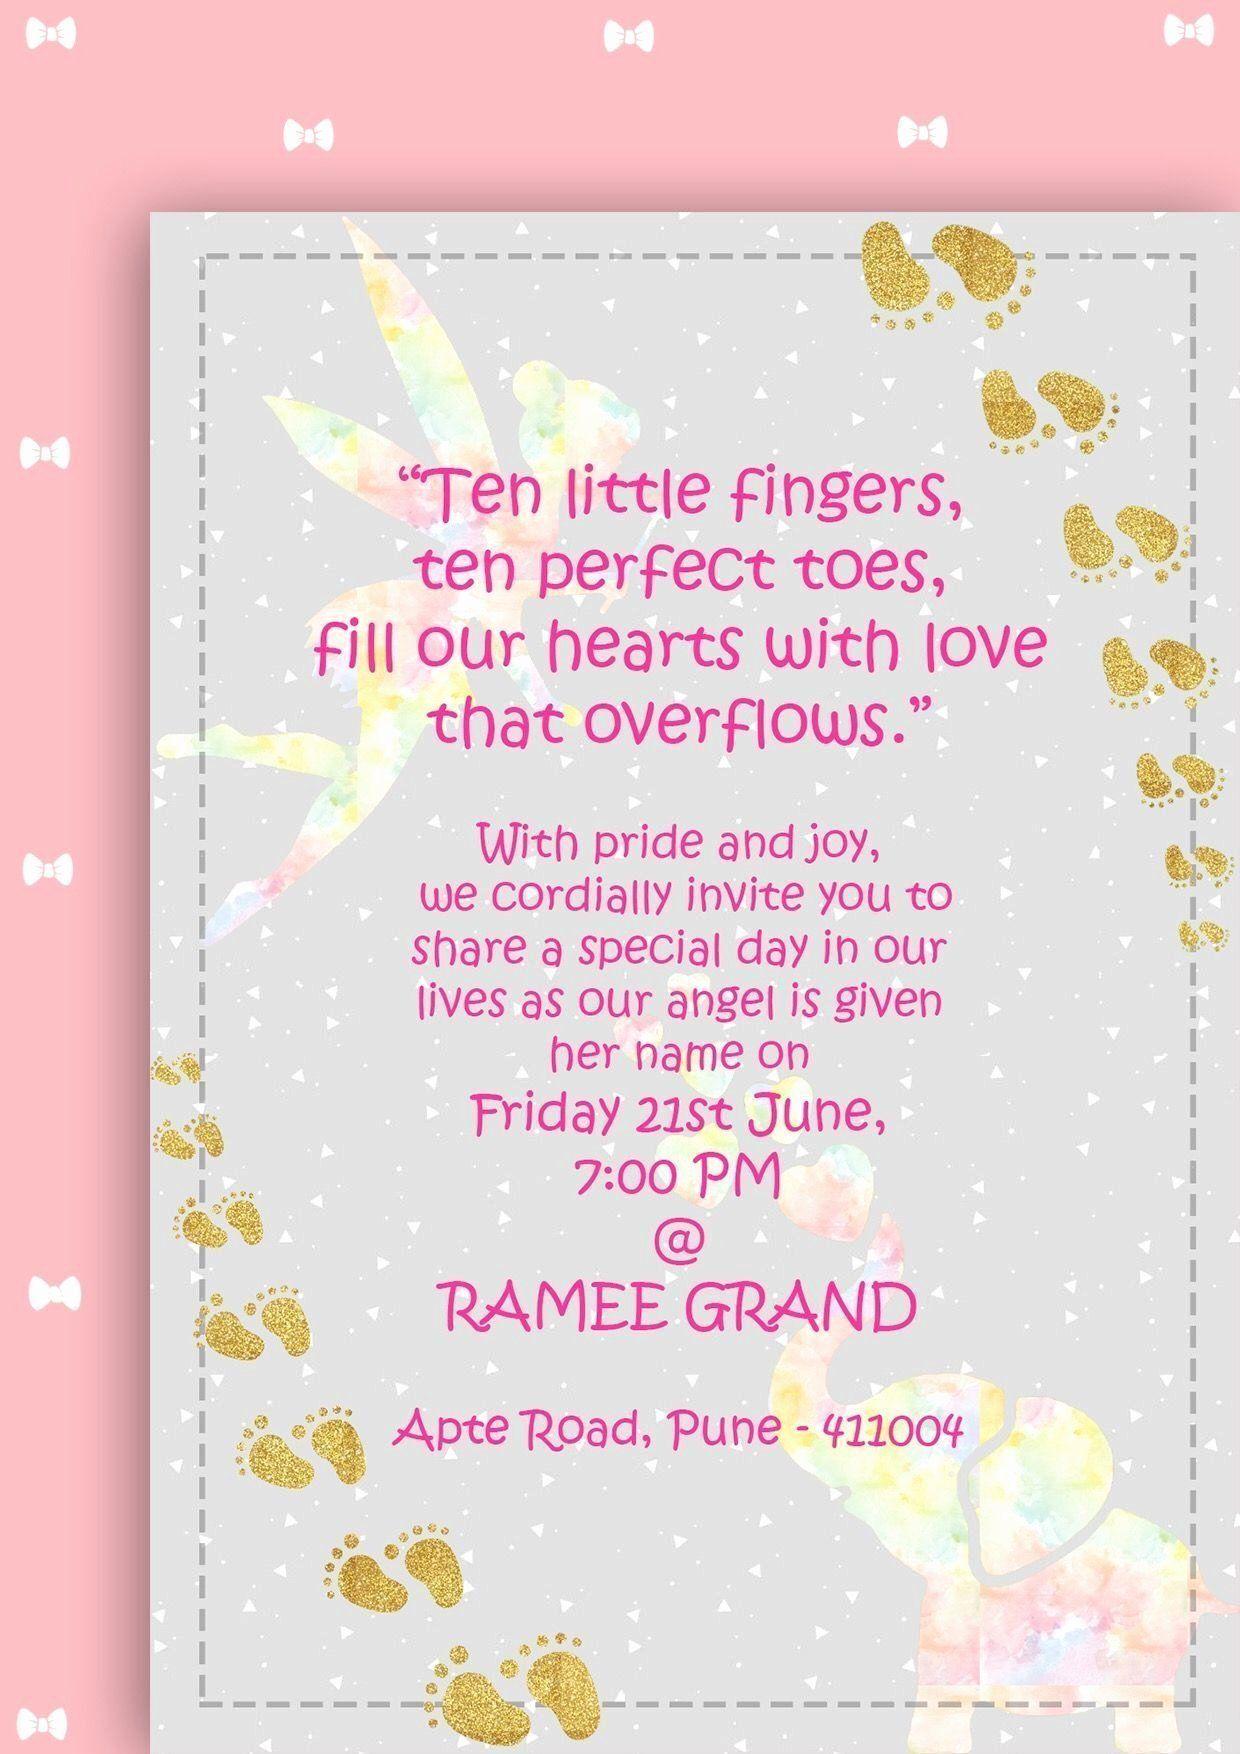 Cradle Ceremony Invitation Message Best Of Naming Ceremony Invitation Babygirl Indian Pastels Naming Ceremony Invitation Naming Ceremony Cradle Ceremony